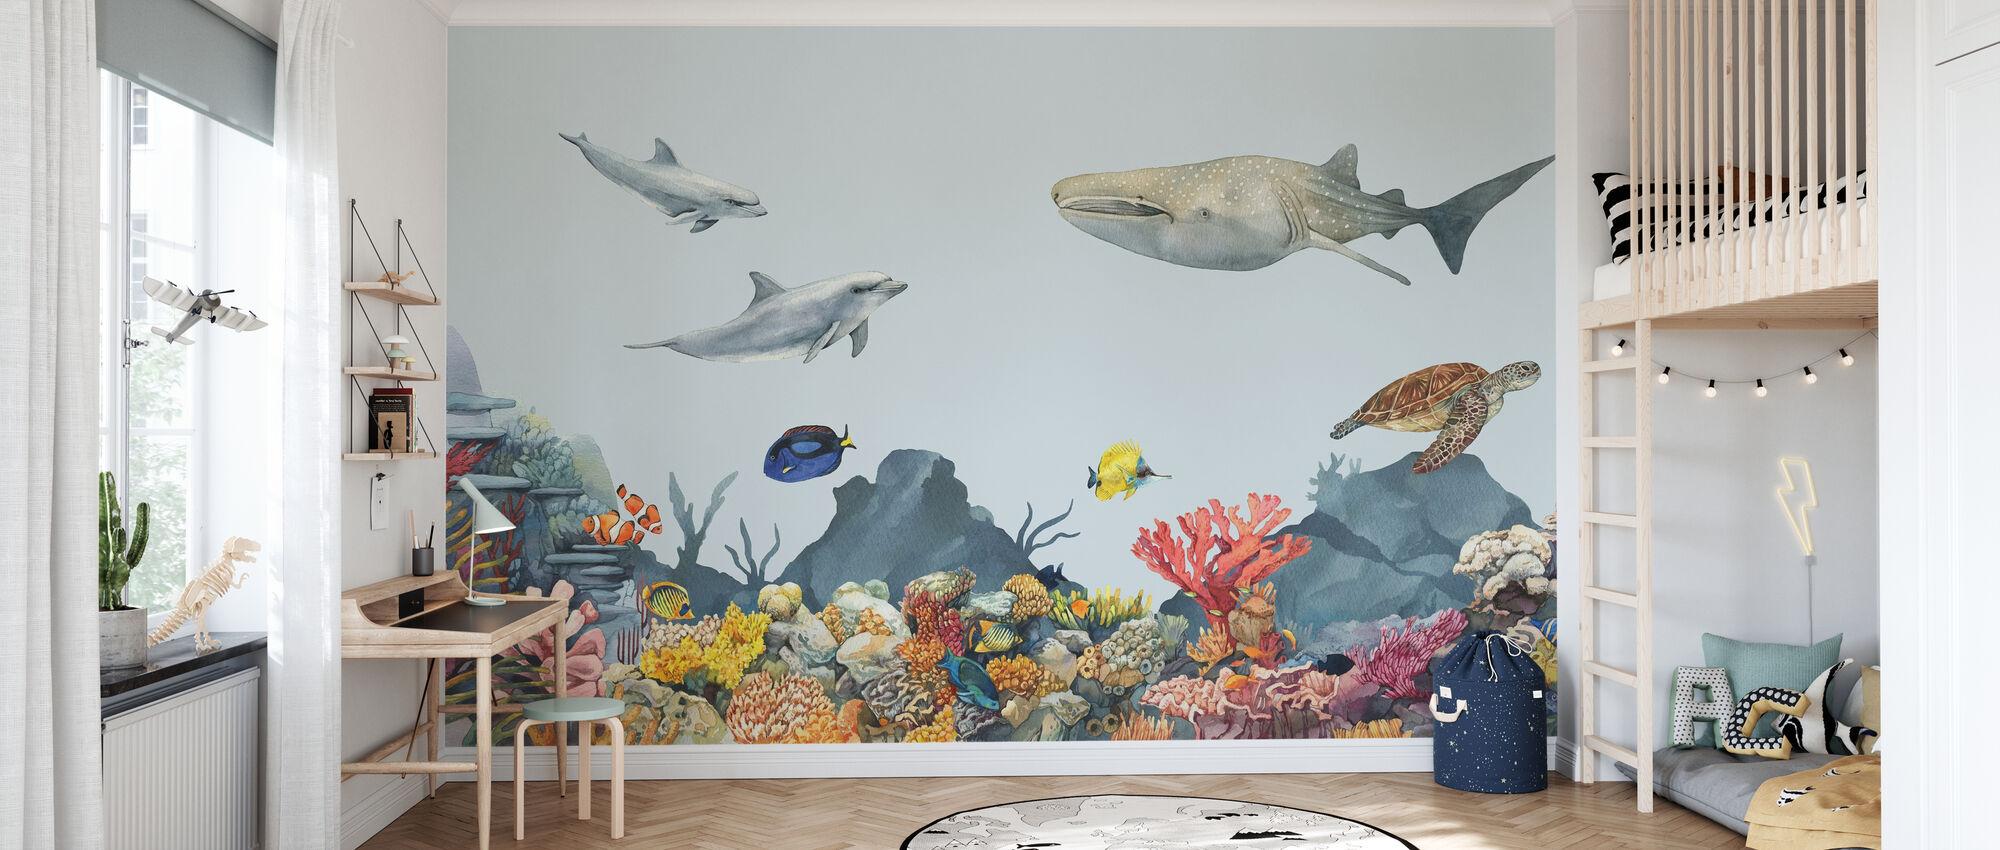 Underwater Friends - Wallpaper - Kids Room